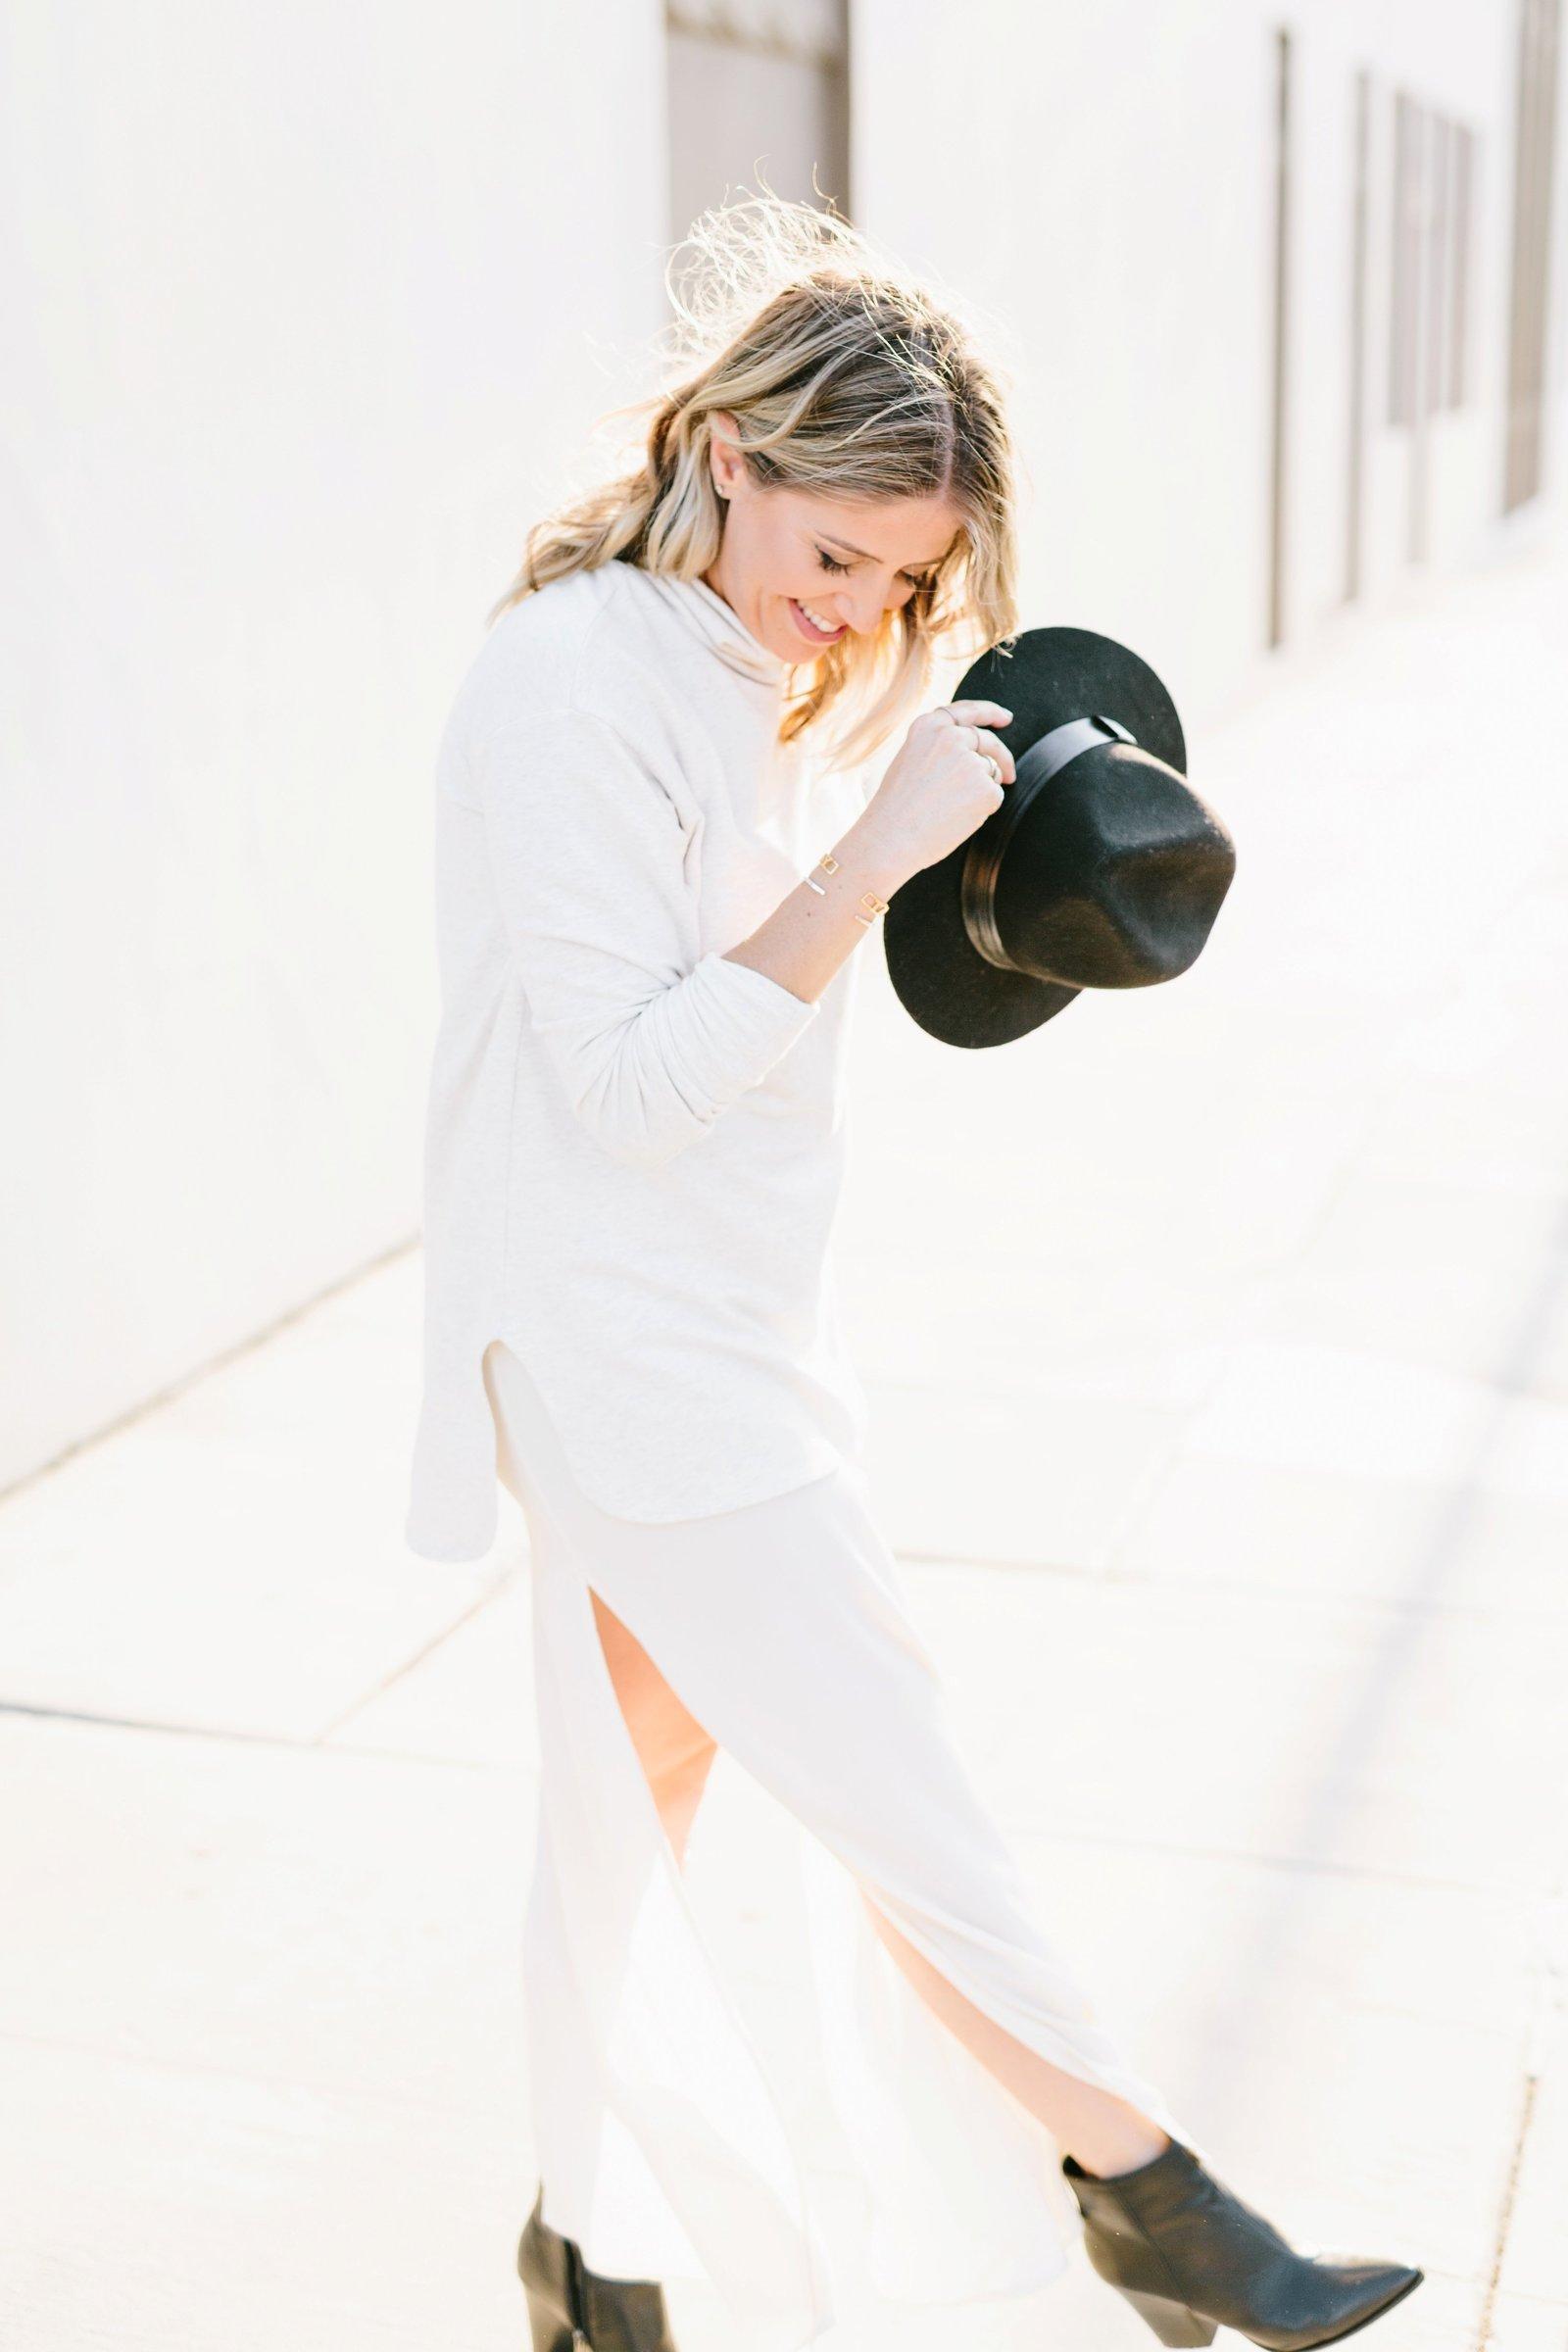 Fashion-Jodee Debes Photography-123